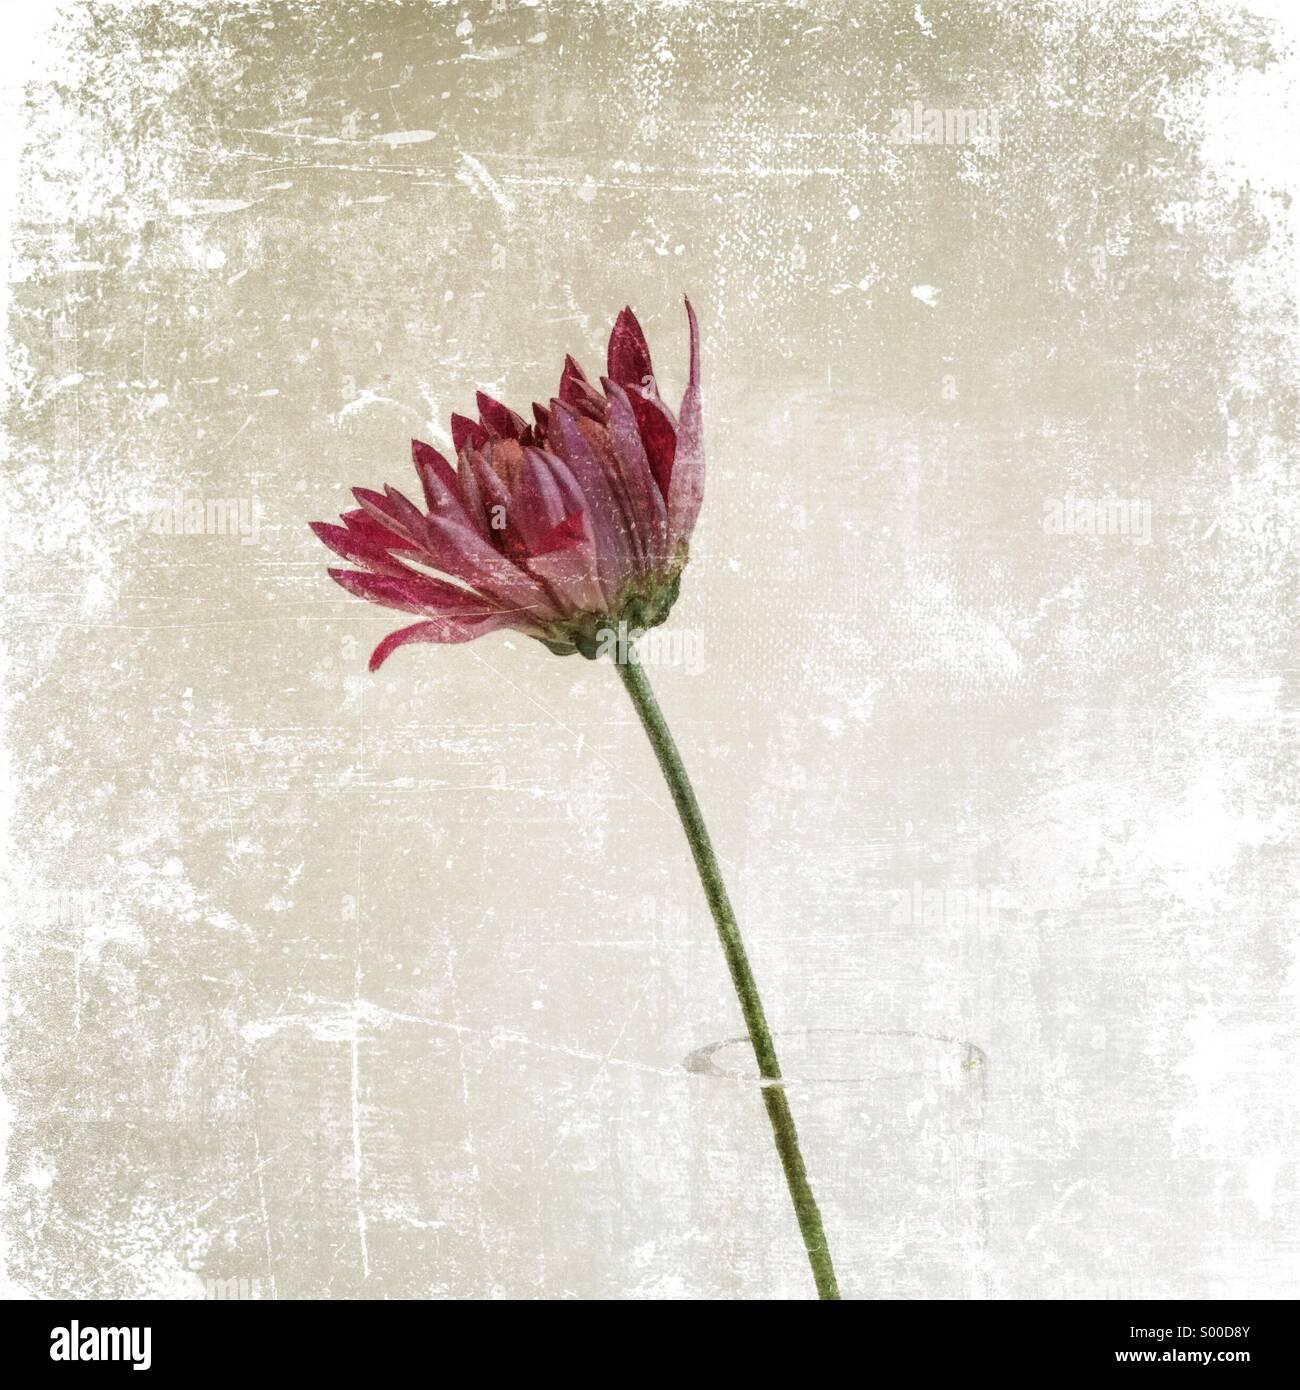 Flor rosa con pétalos ligeramente asqueroso en un jarrón transparente. Still life texturado Imagen De Stock